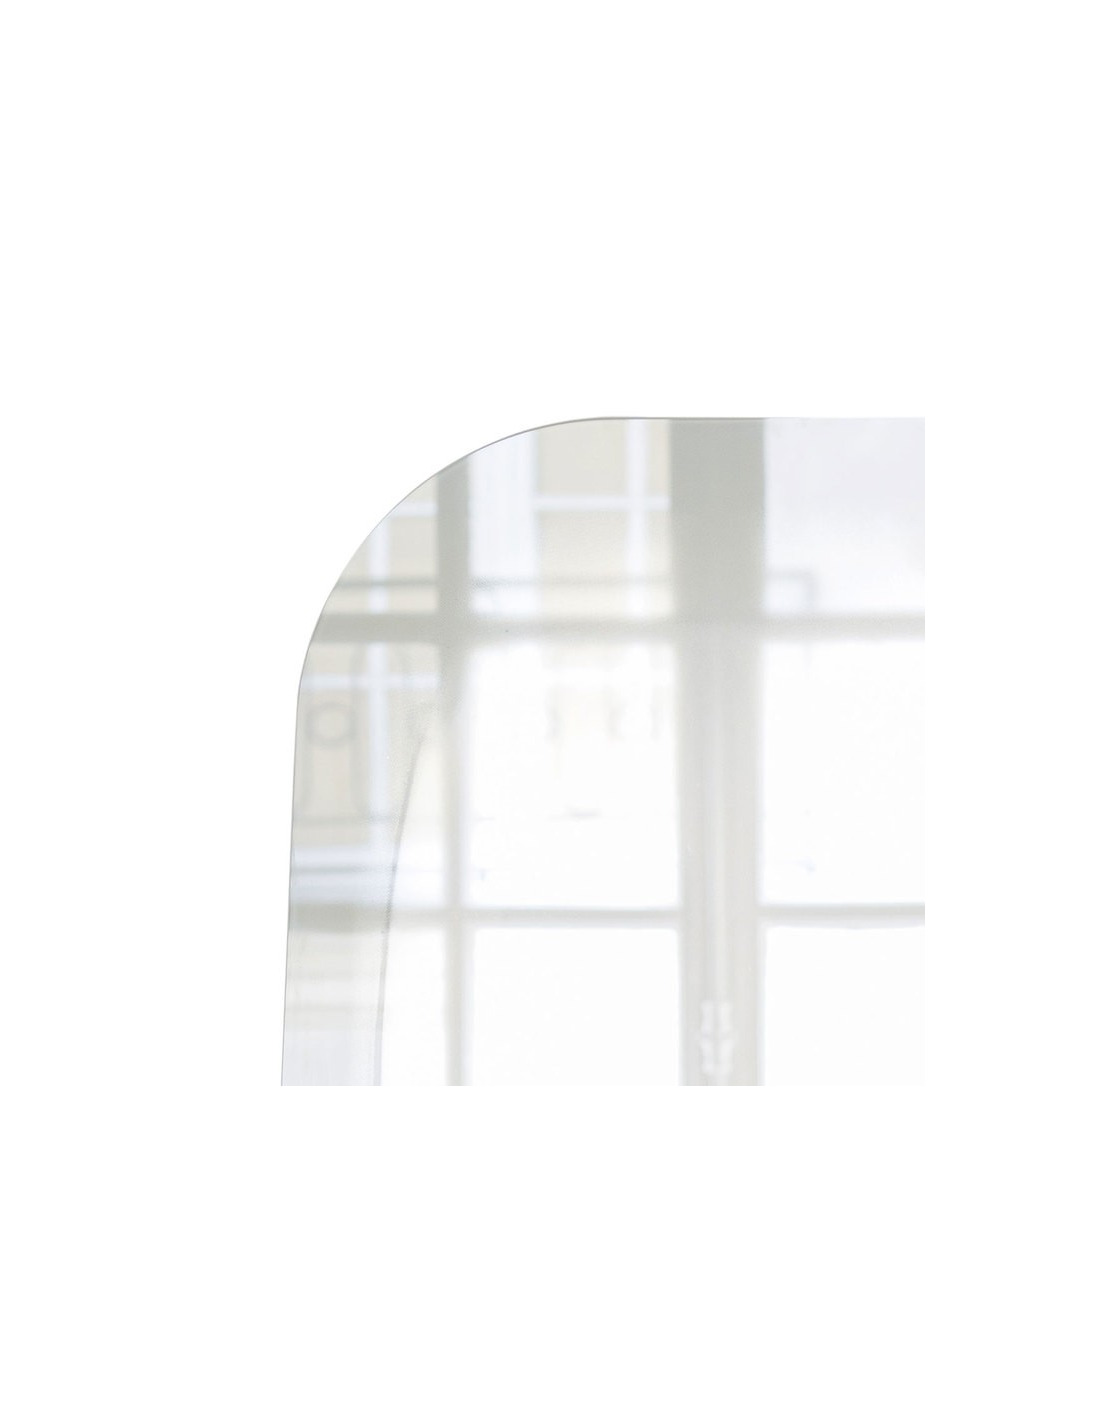 Miroir design fading blanc par thomas eurlings otoko for Eurlings interieur